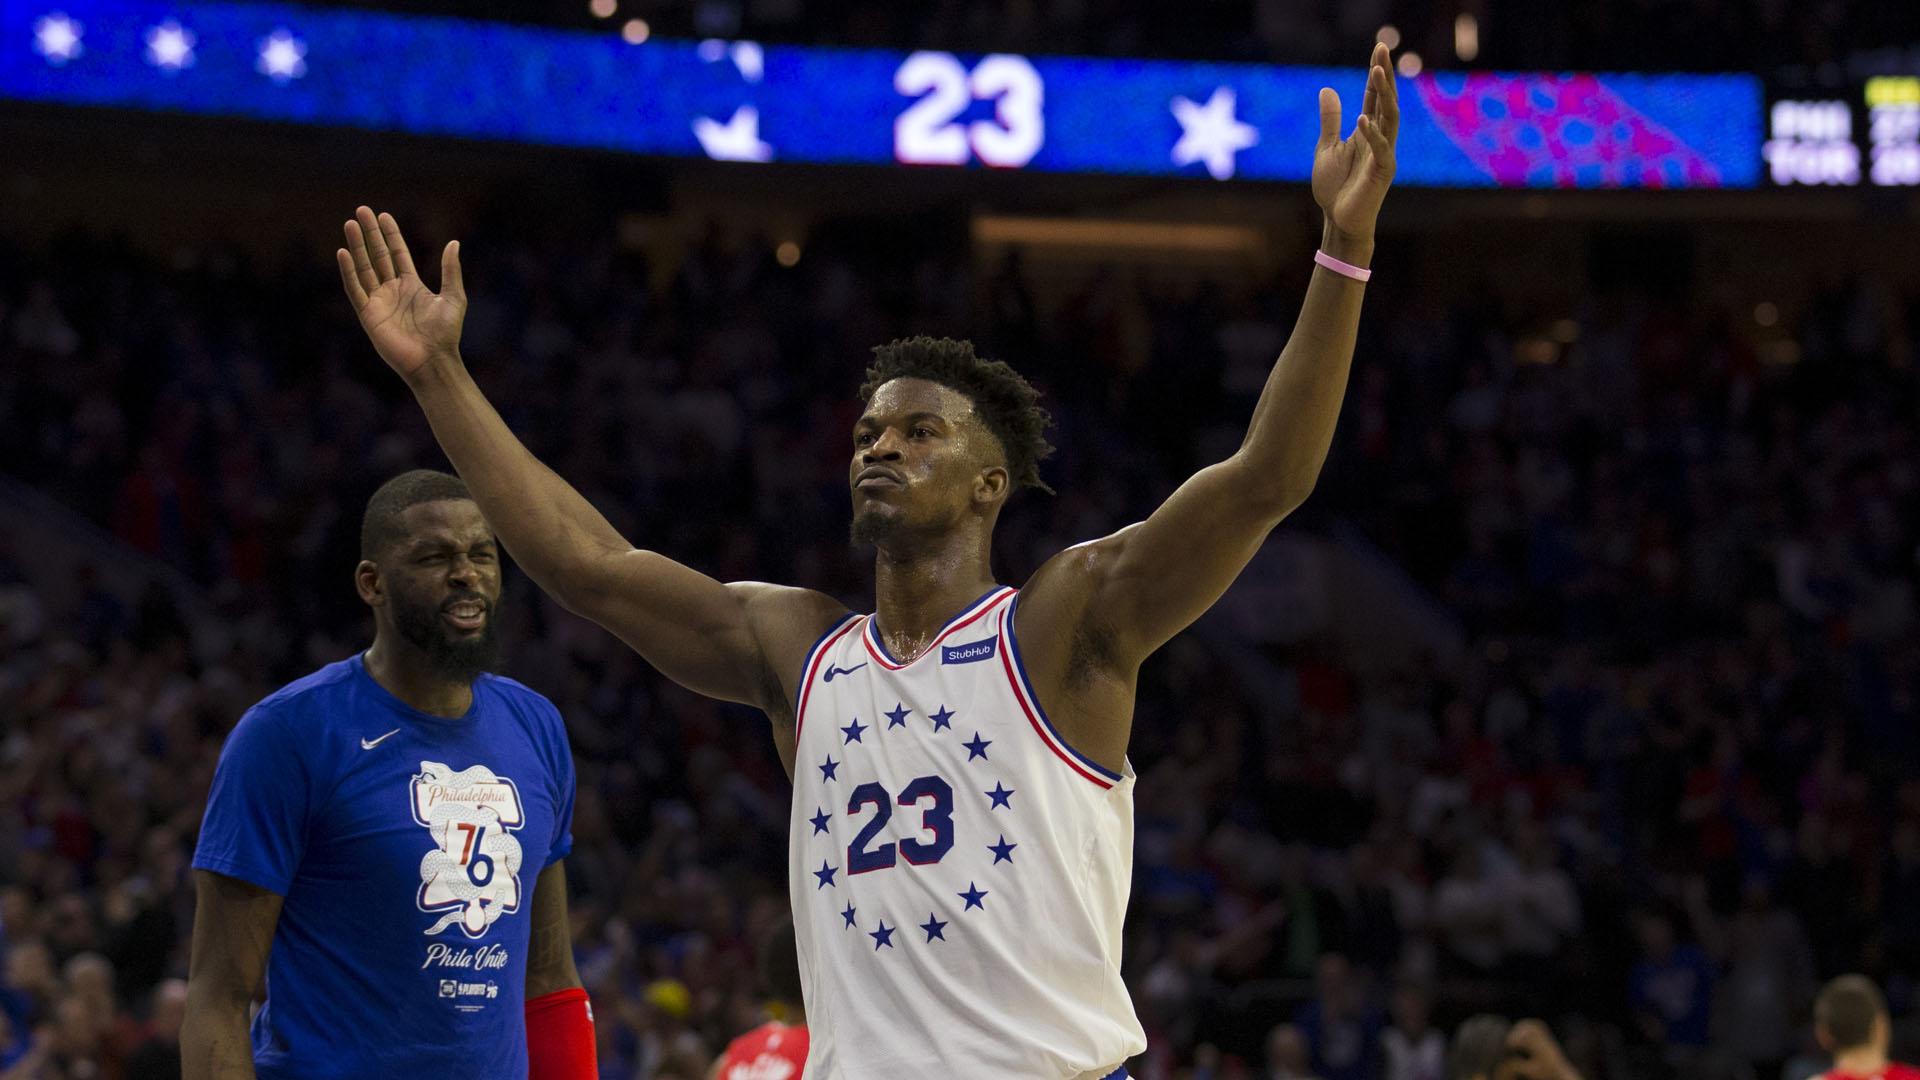 76ers force Game 7 against Raptors